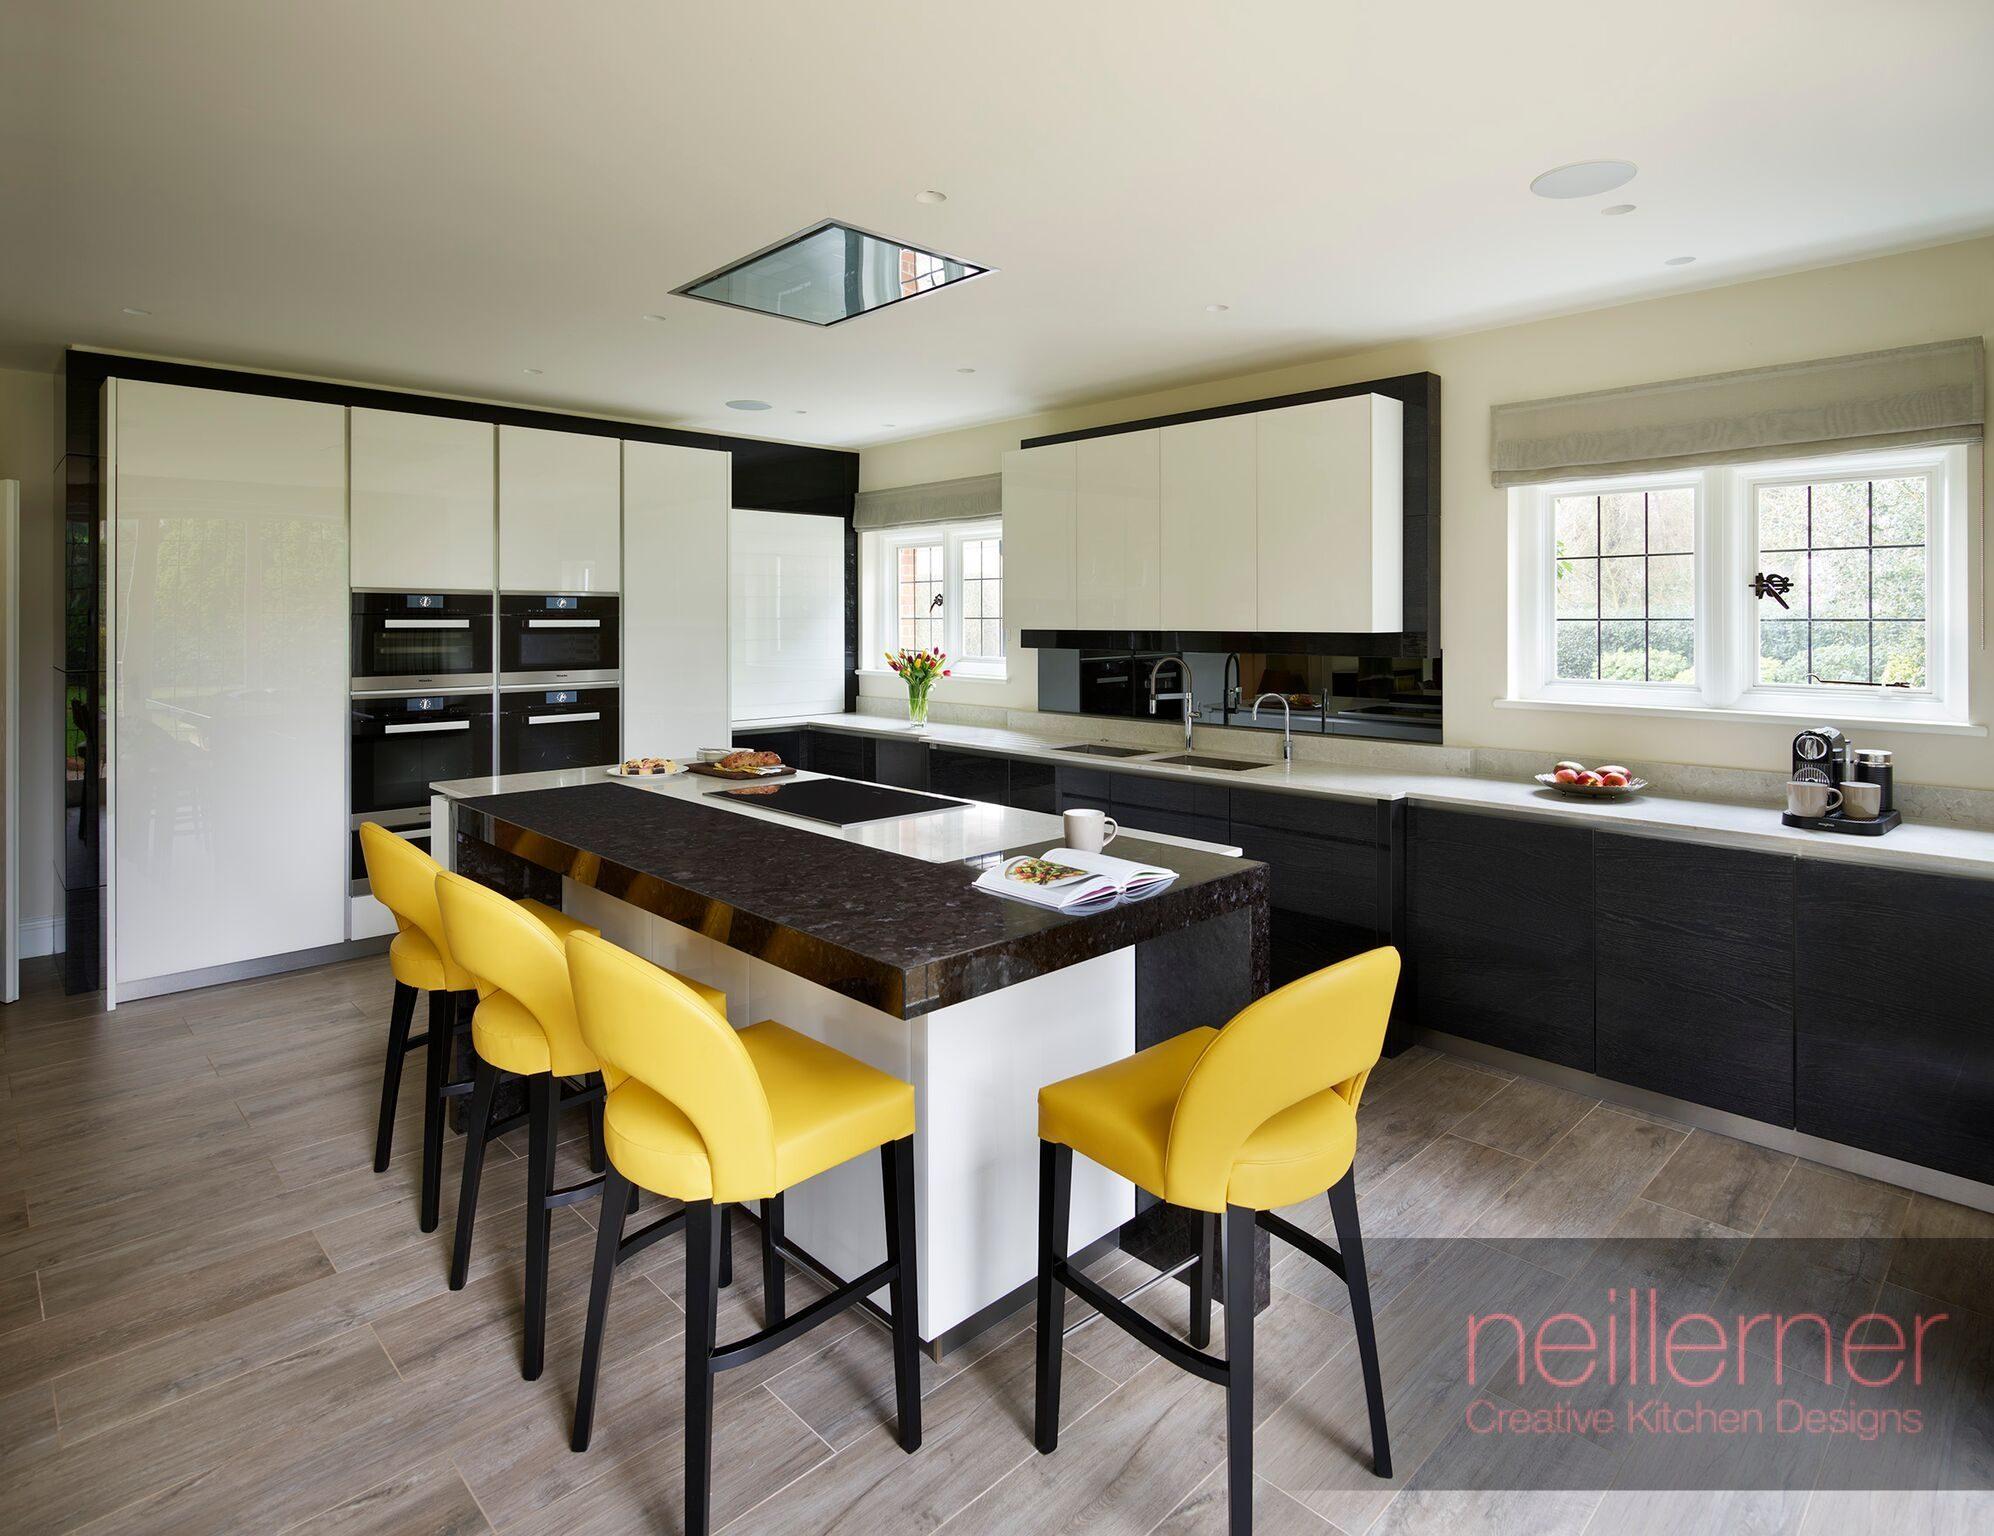 Quality Kitchen Designs Hertfordshire | Modern Kitchens | Neil ...